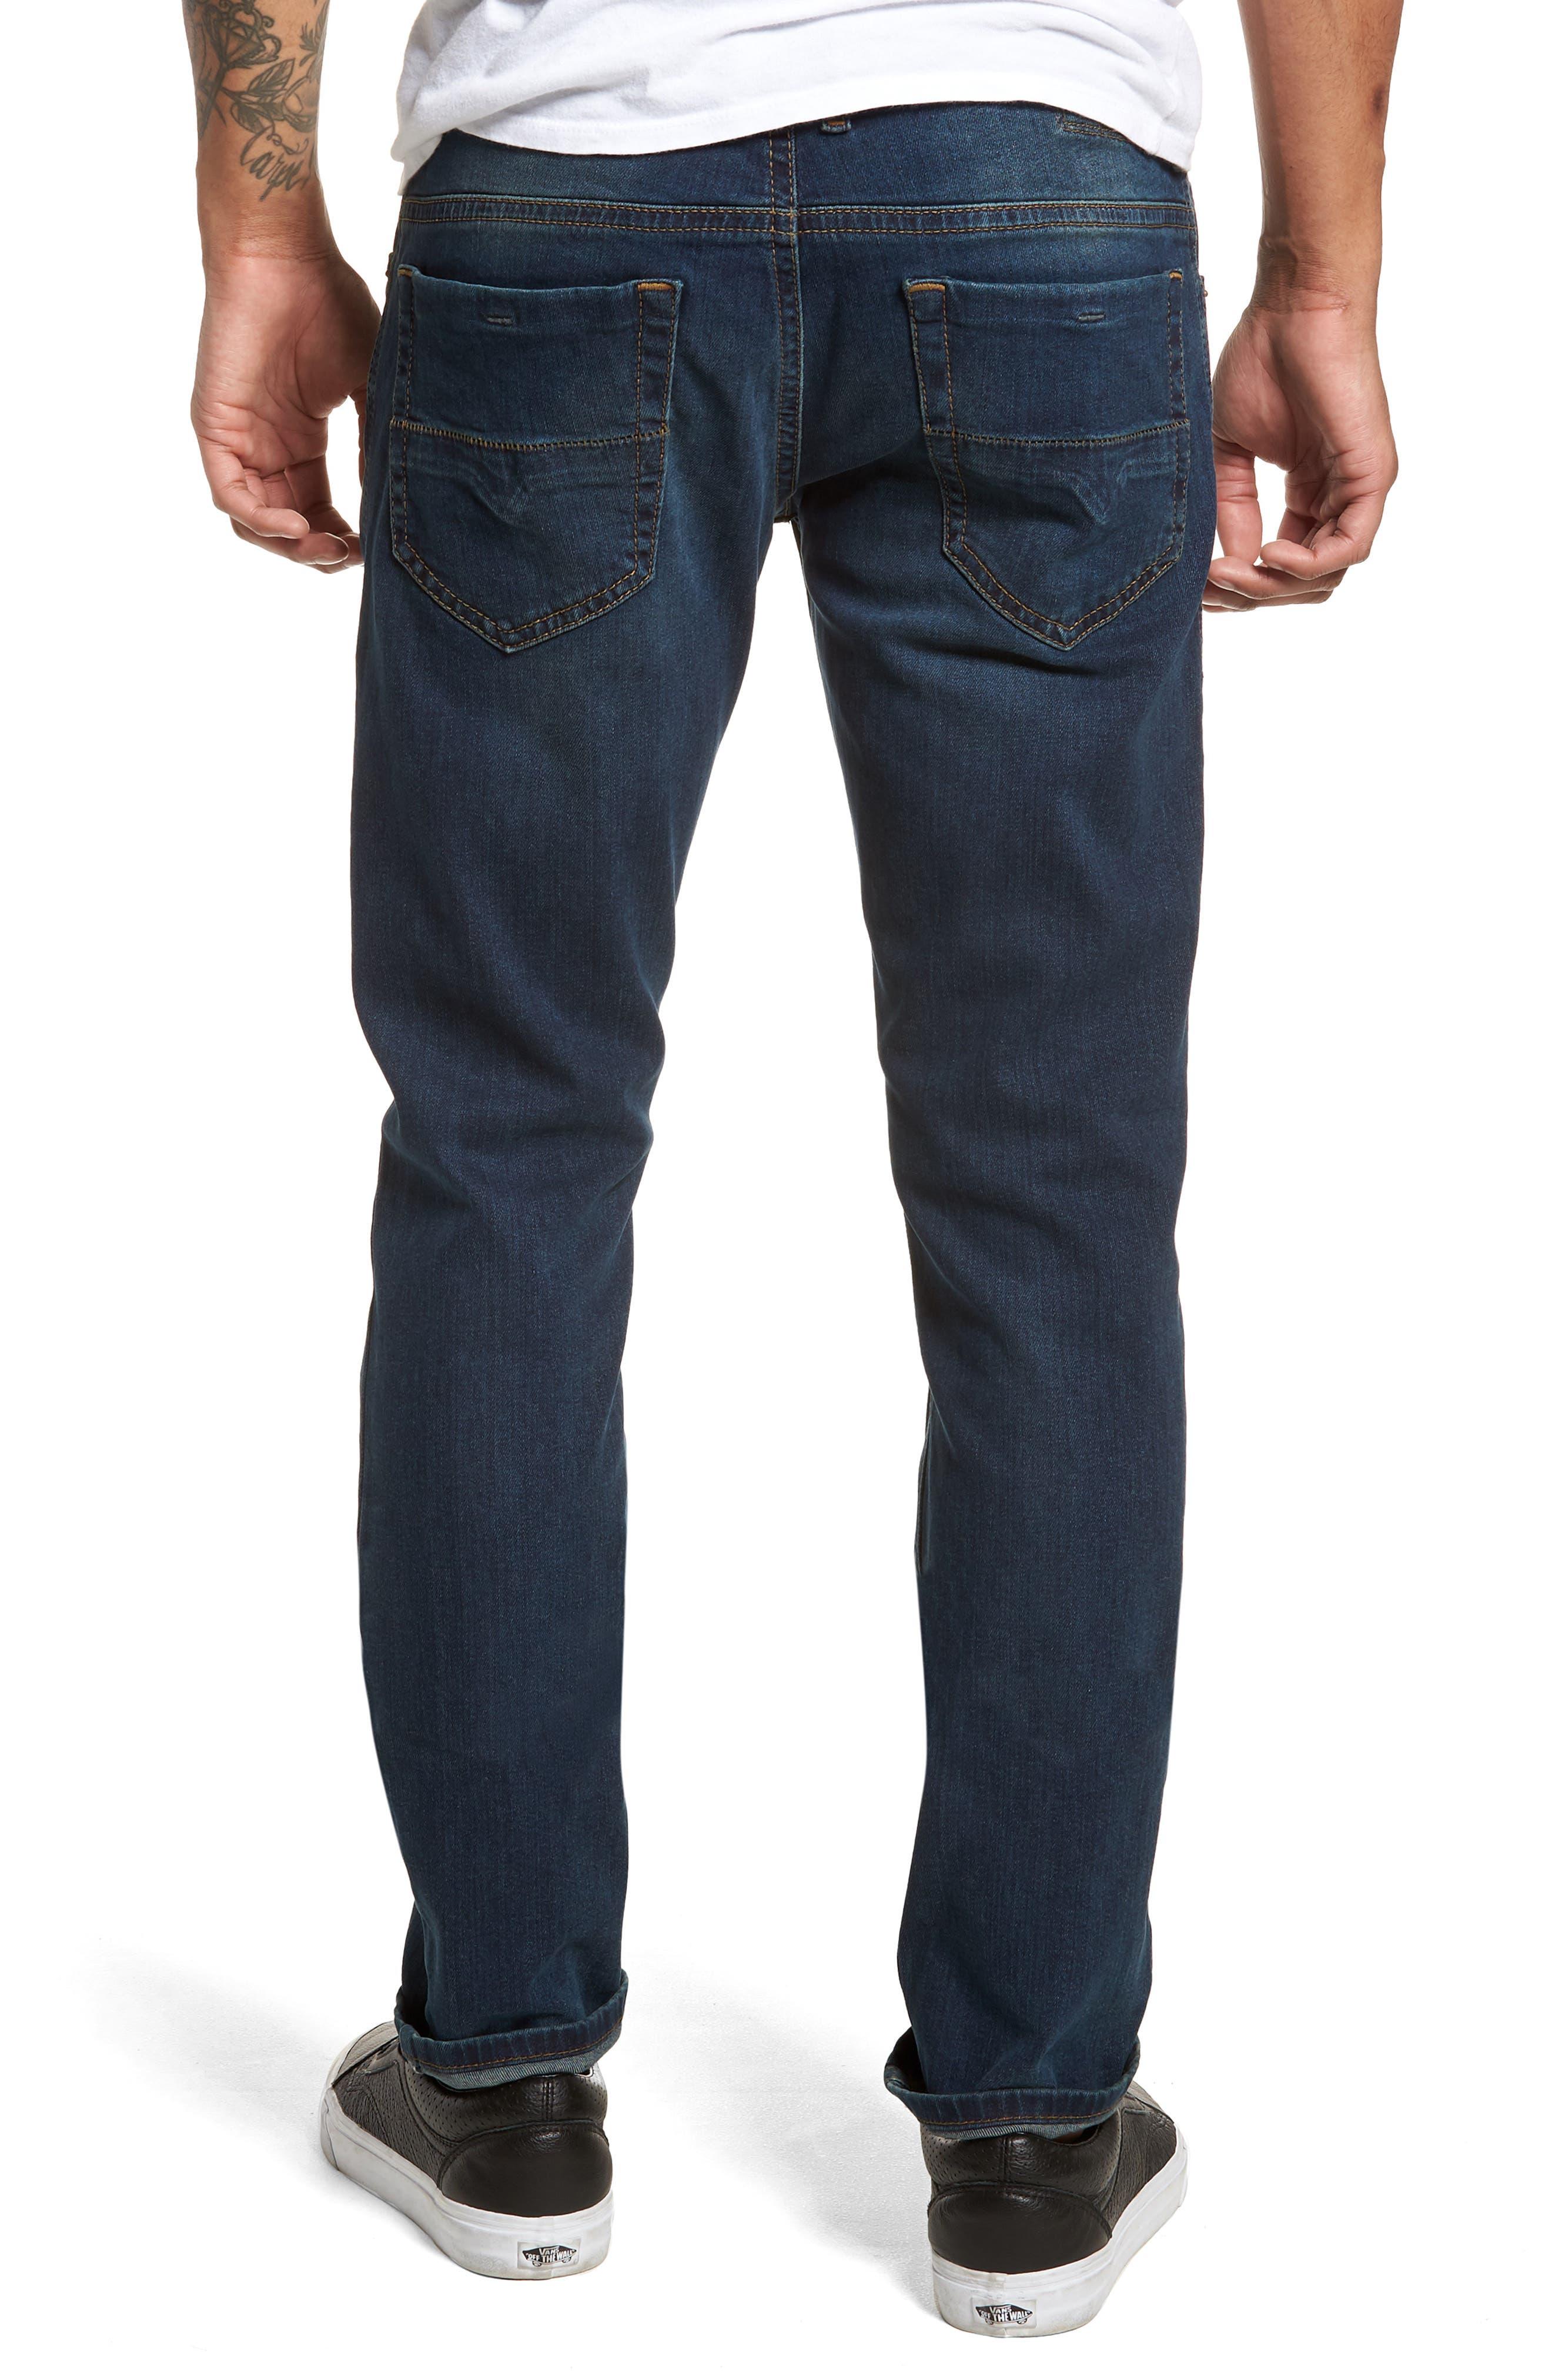 Thommer Skinny Fit Jeans,                             Alternate thumbnail 2, color,                             Blue